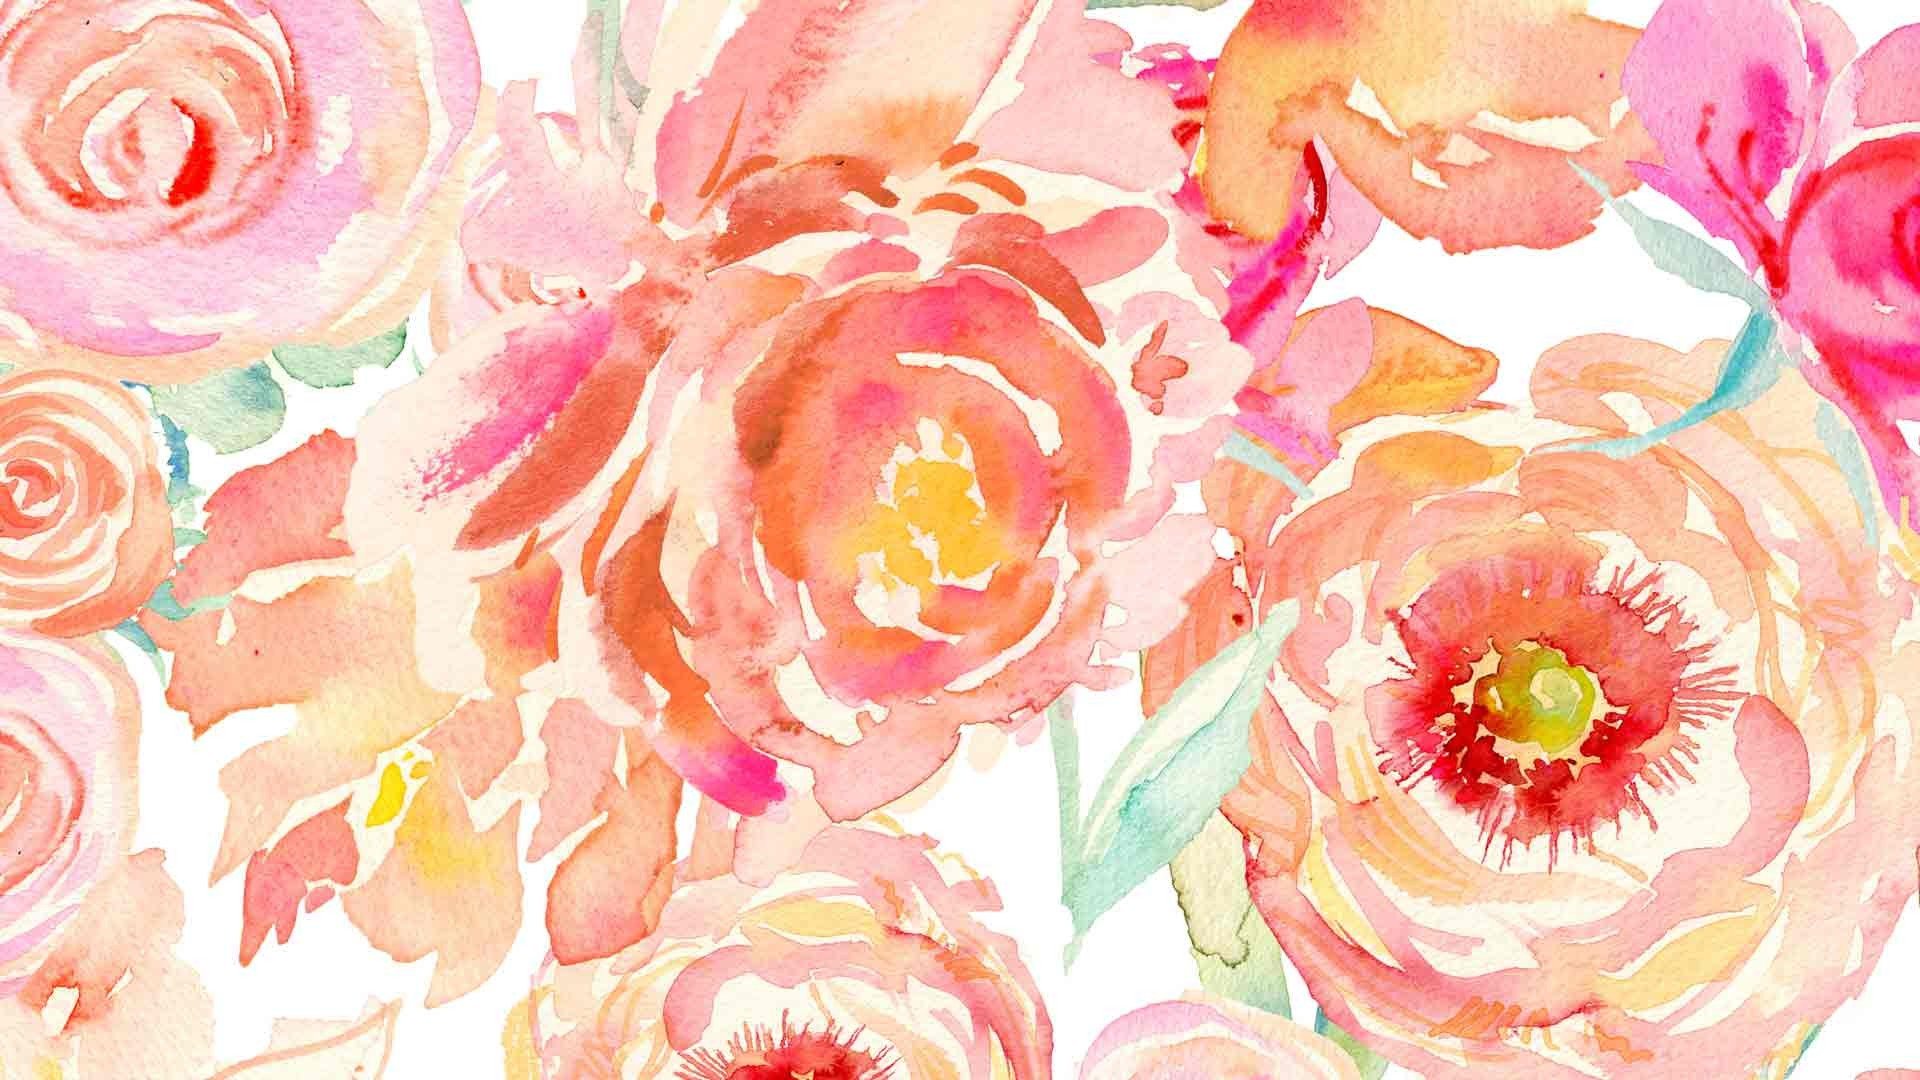 Orange Fall Peony Wallpaper Watercolor Background Tumblr 183 ① Download Free Beautiful